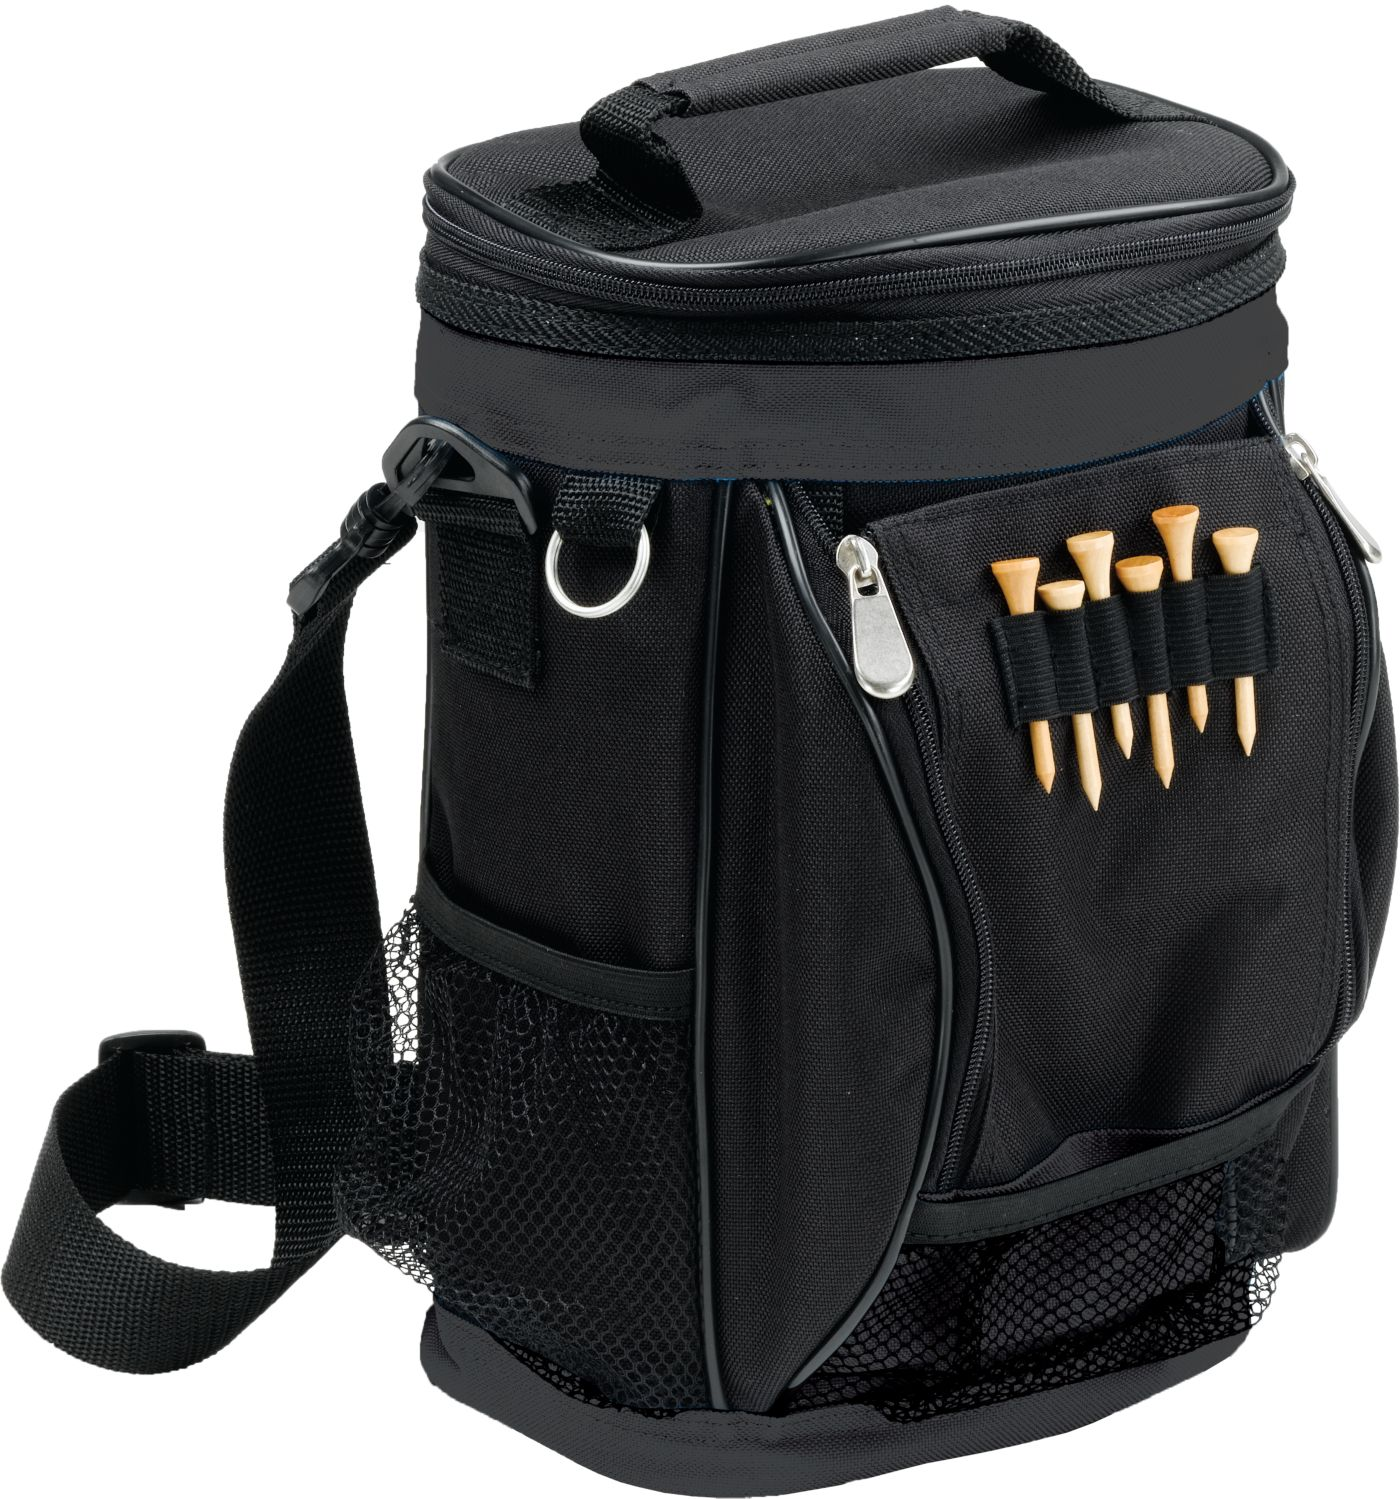 Maxfli Golf Bag Cooler